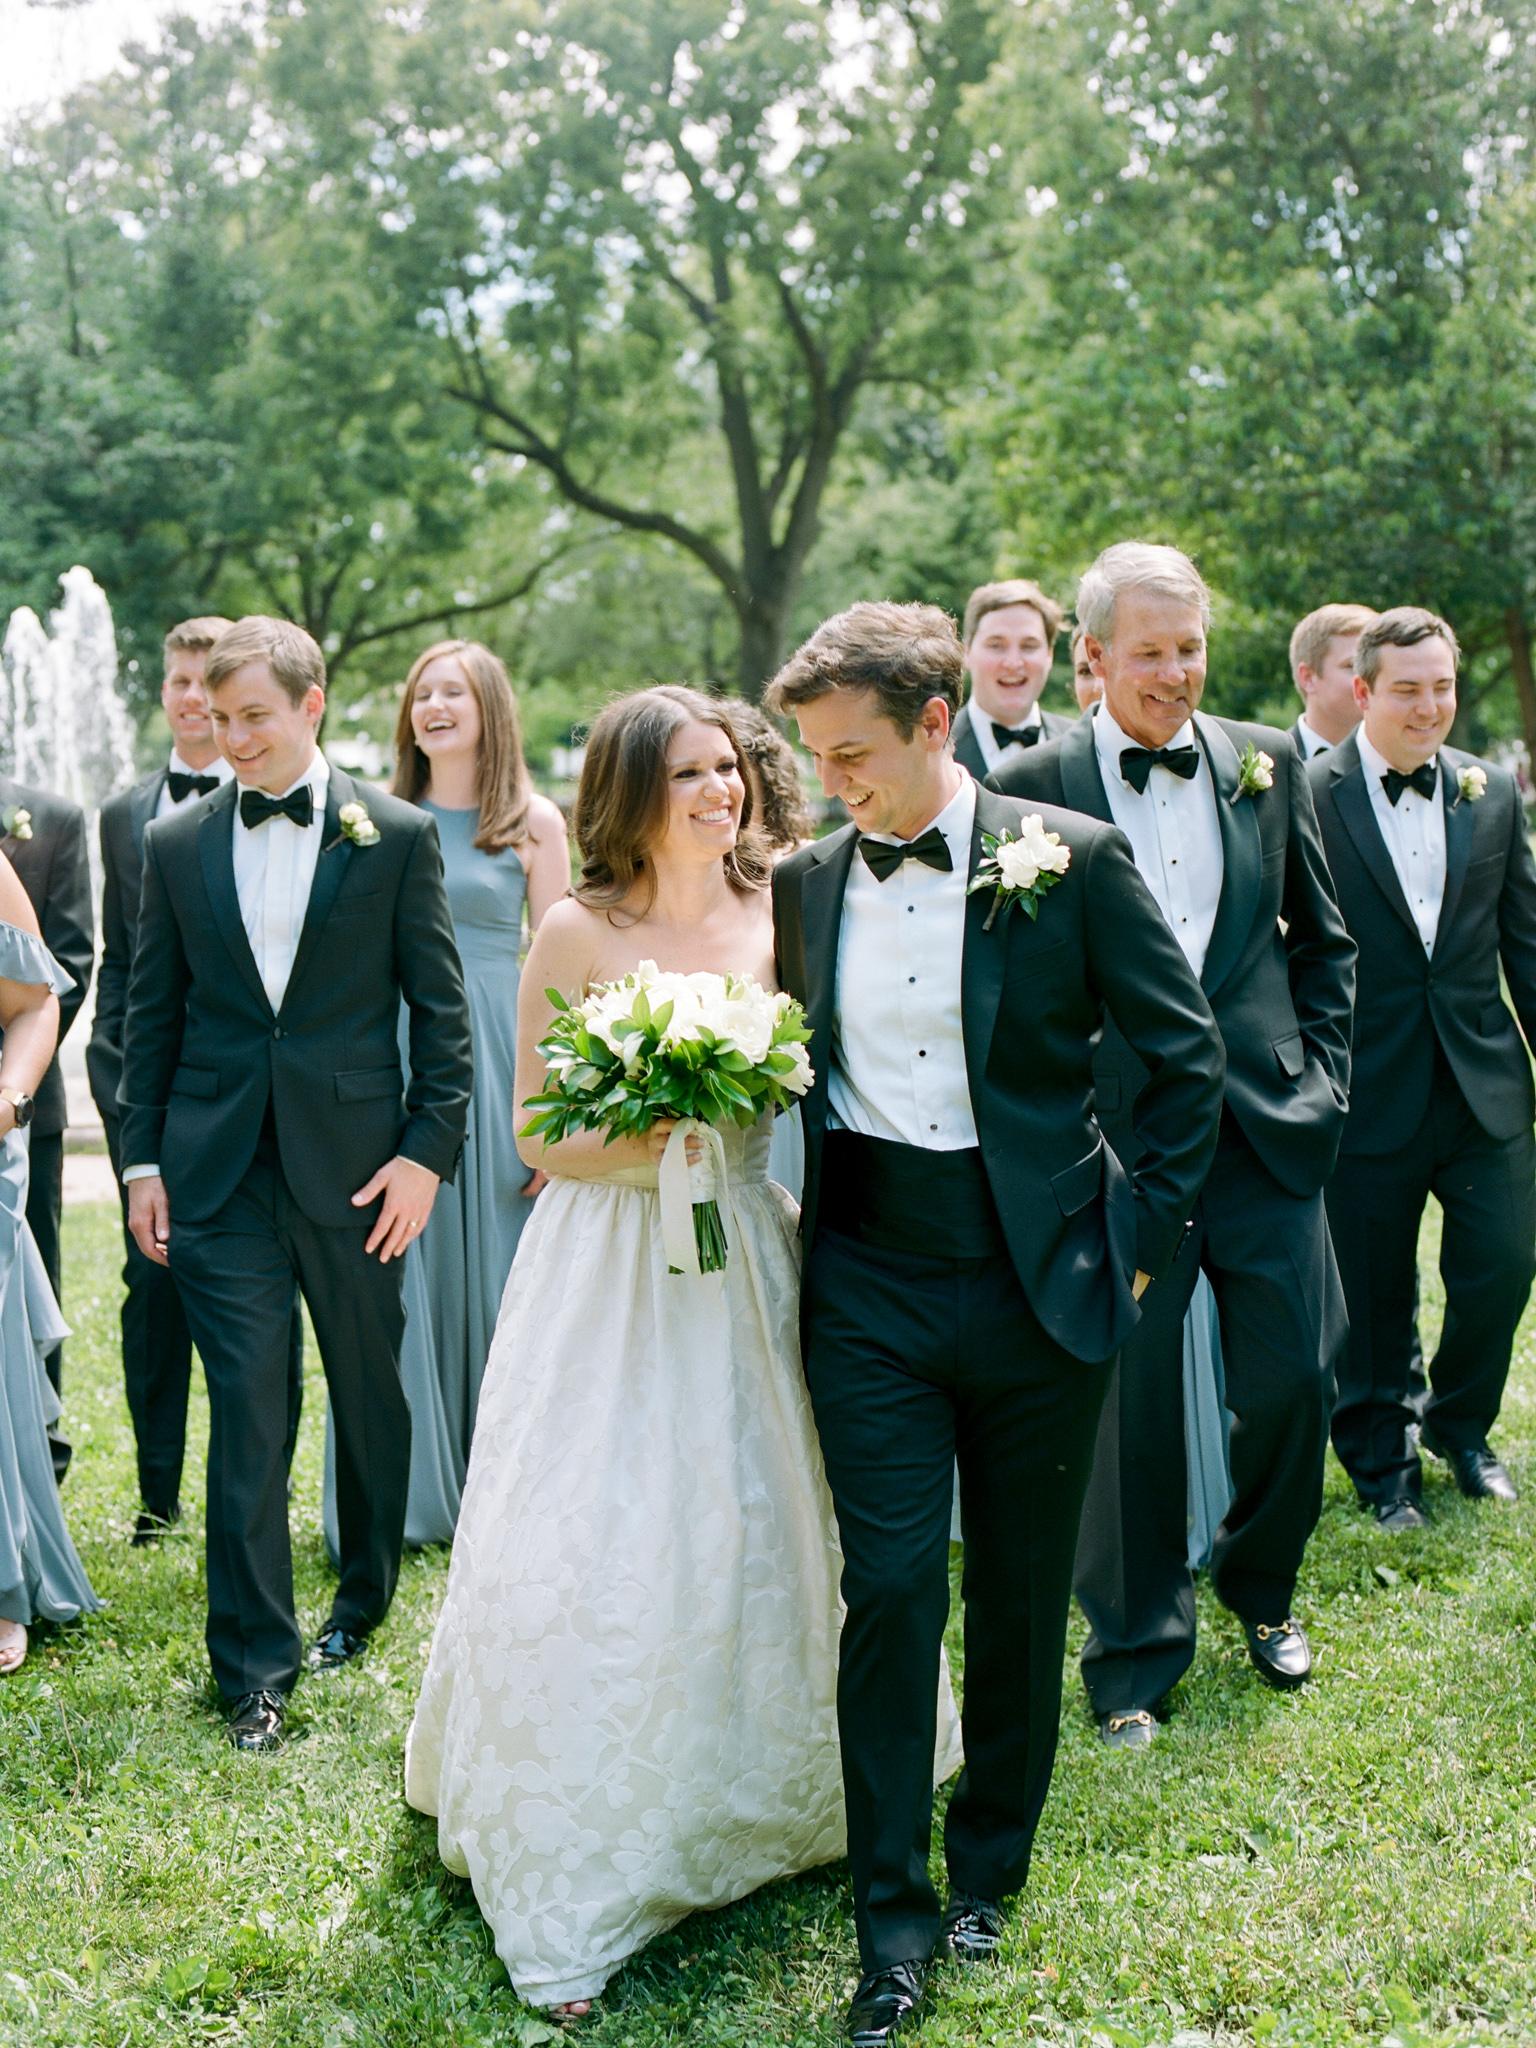 Classic black tie Summer Wedding at The Mayflower Hotel in Washington DC by fine art wedding photographer Lissa Ryan Photography